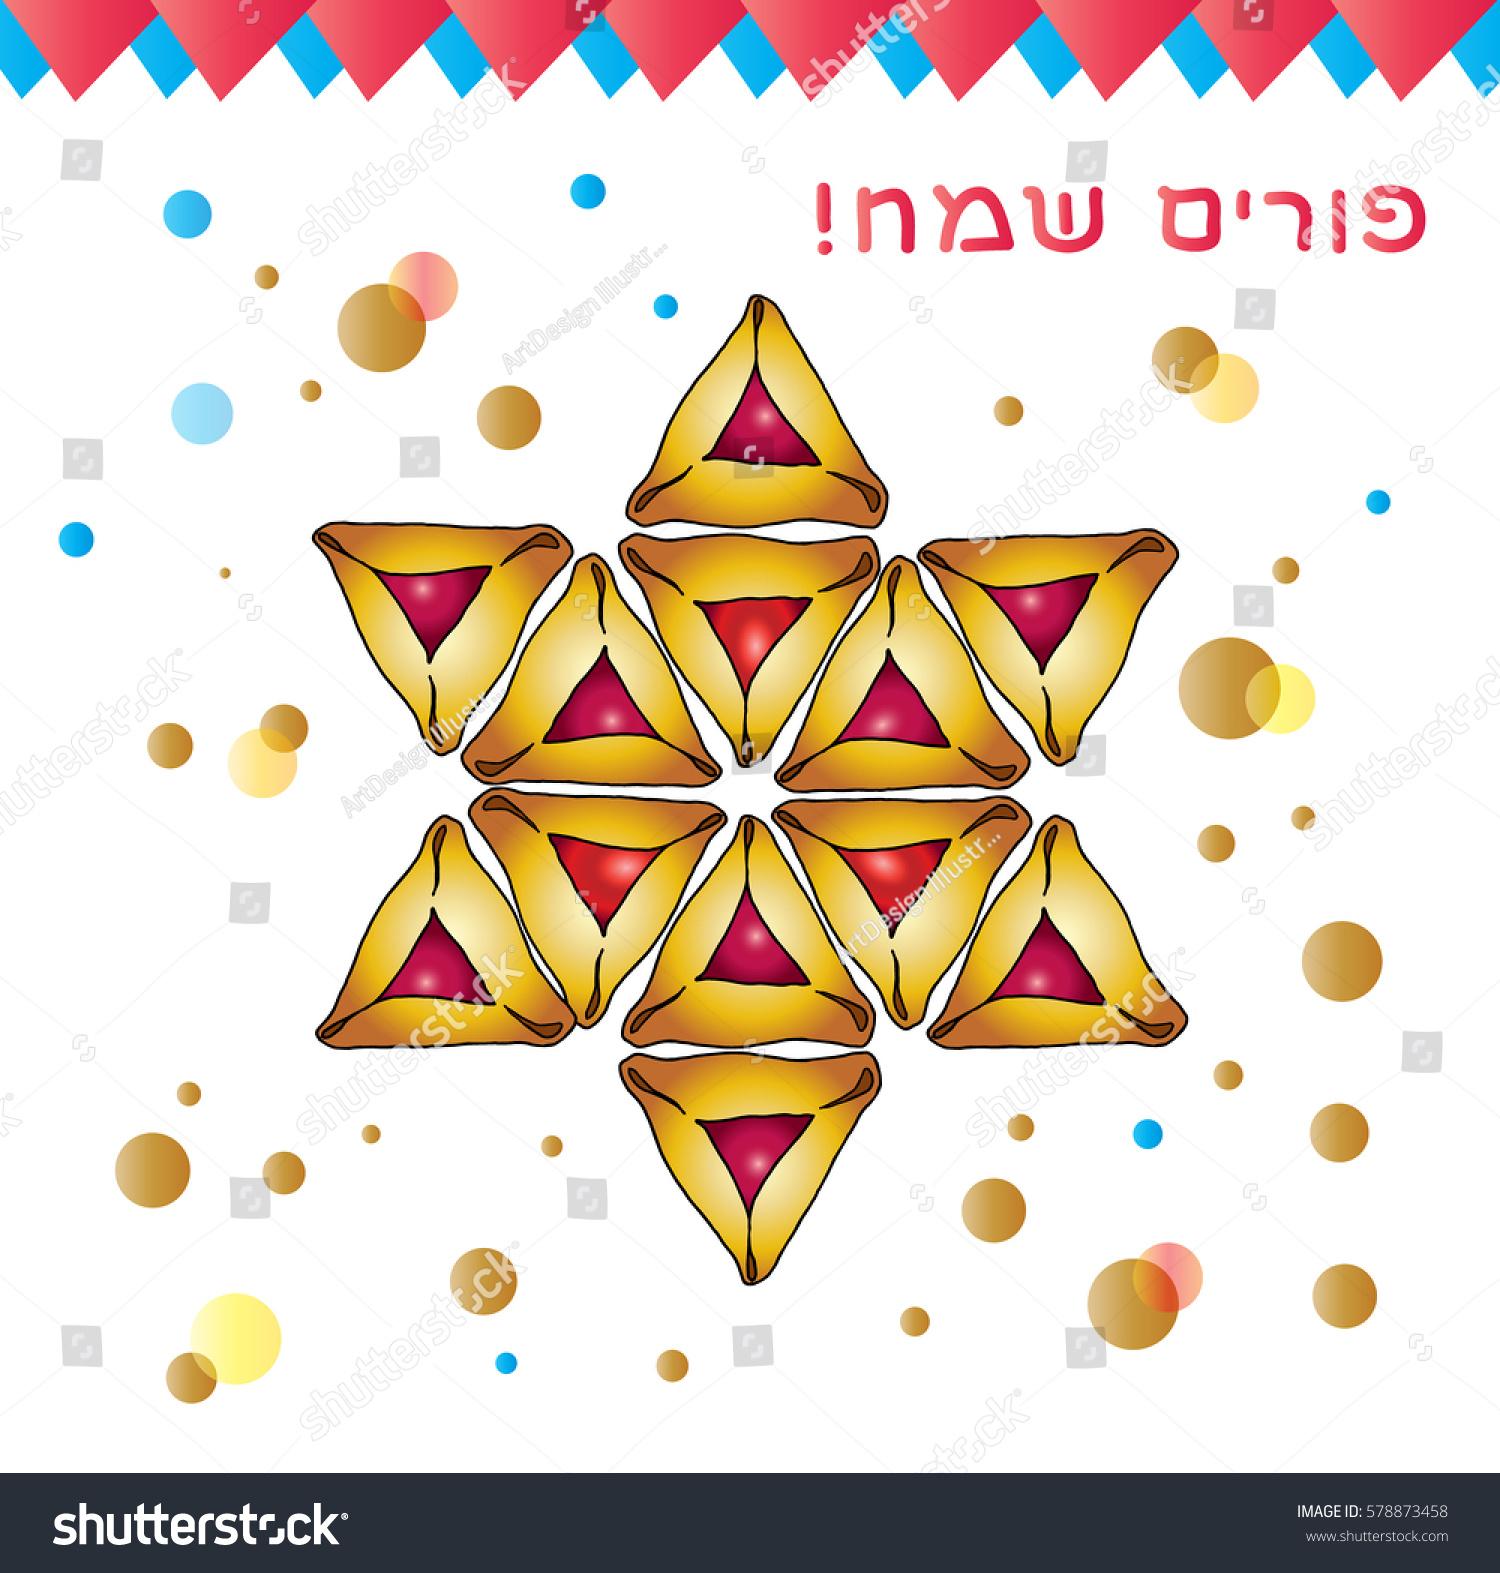 Happy purim greeting card translation hebrew stock photo photo happy purim greeting card translation from hebrew happy purim purim jewish holiday decorative poster m4hsunfo